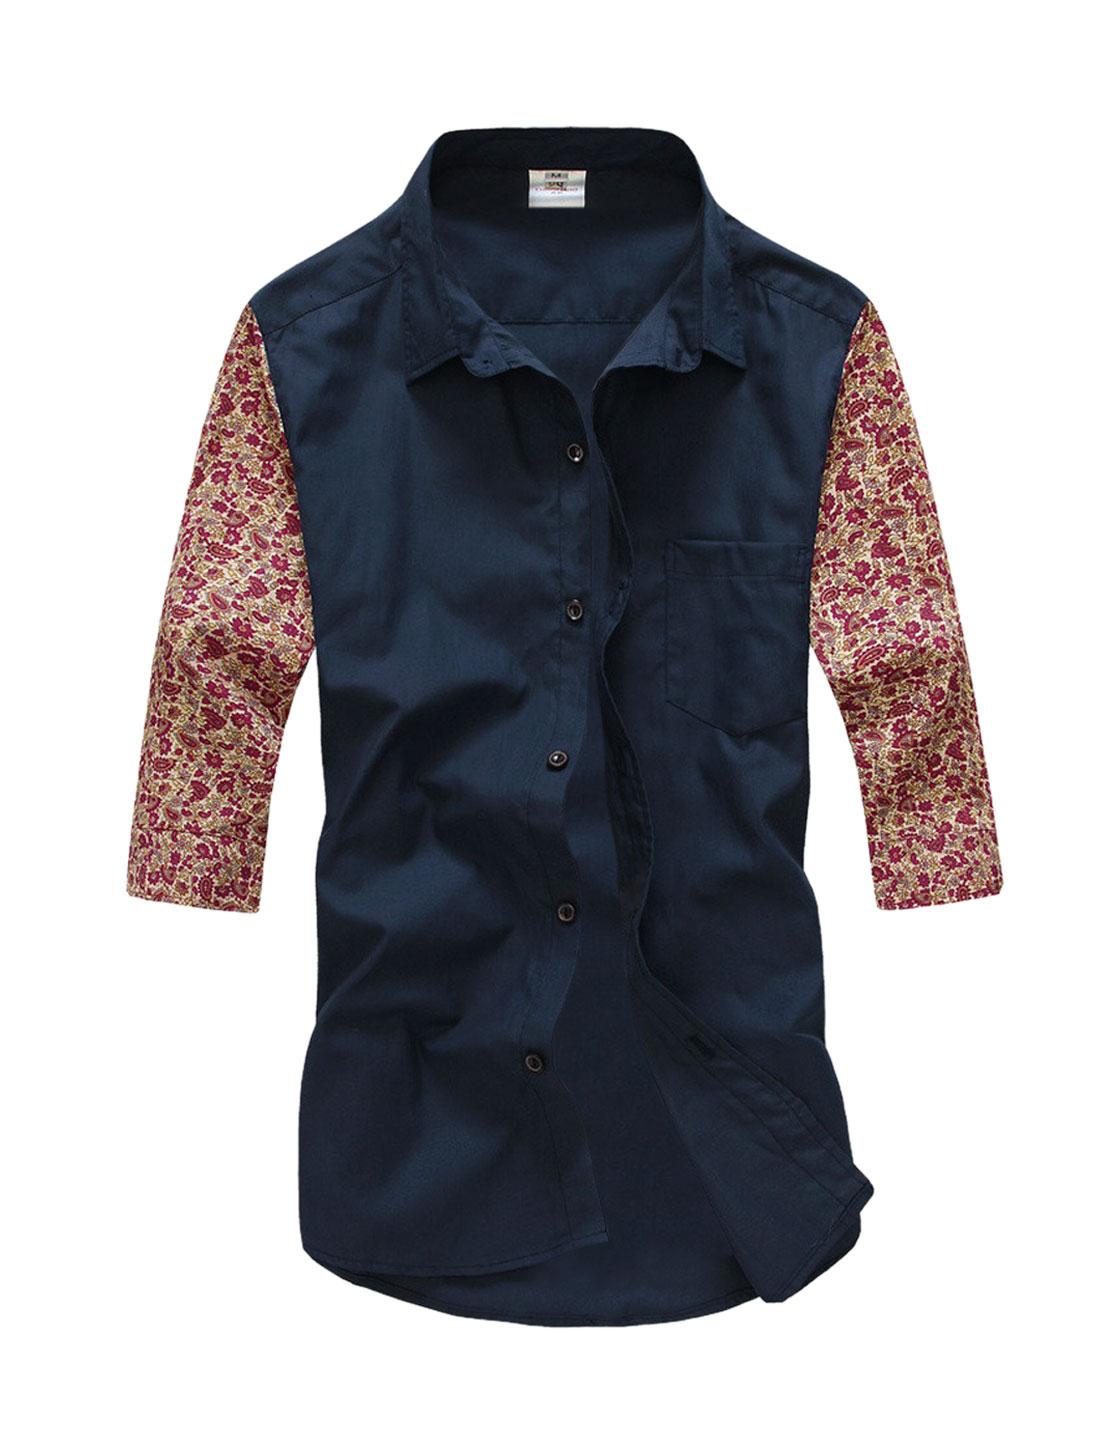 Men 3/4 Sleeve Flower Pattern Paisleys Slim Top Shirt Navy Blue M